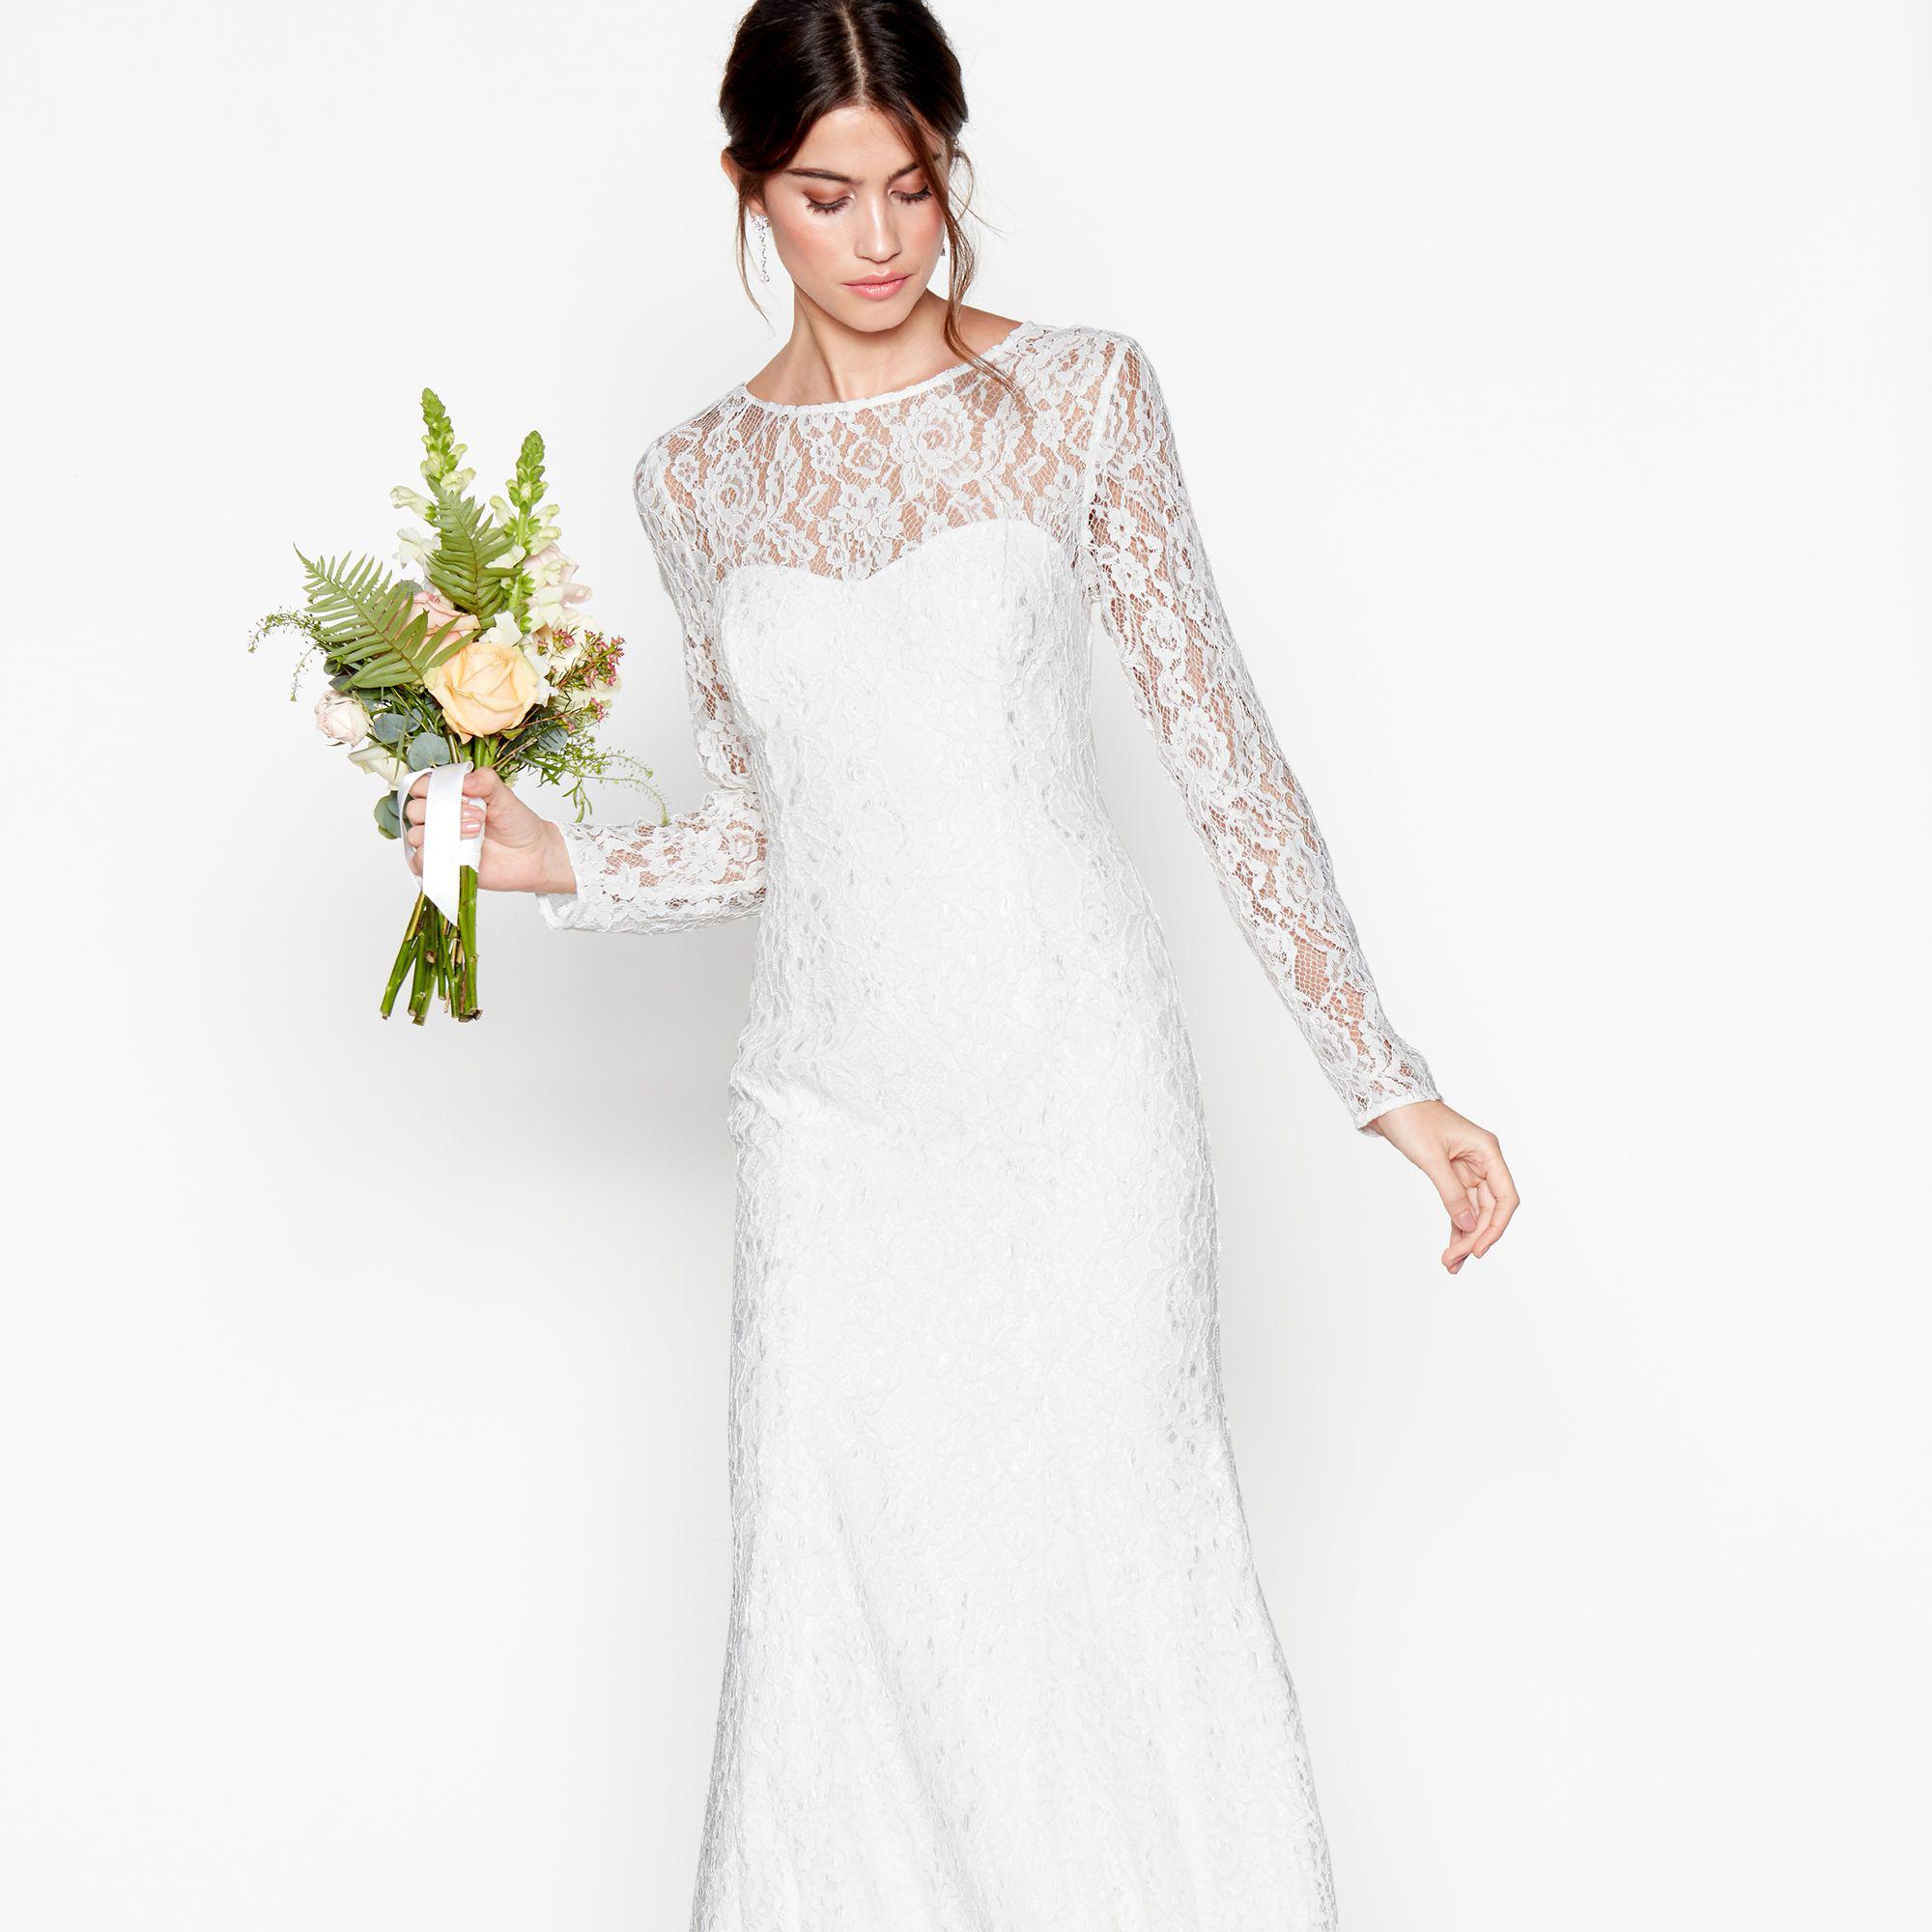 Ivory Lace Eleanor High Neck Long Sleeves Full Length Wedding Dress View Fullscreen